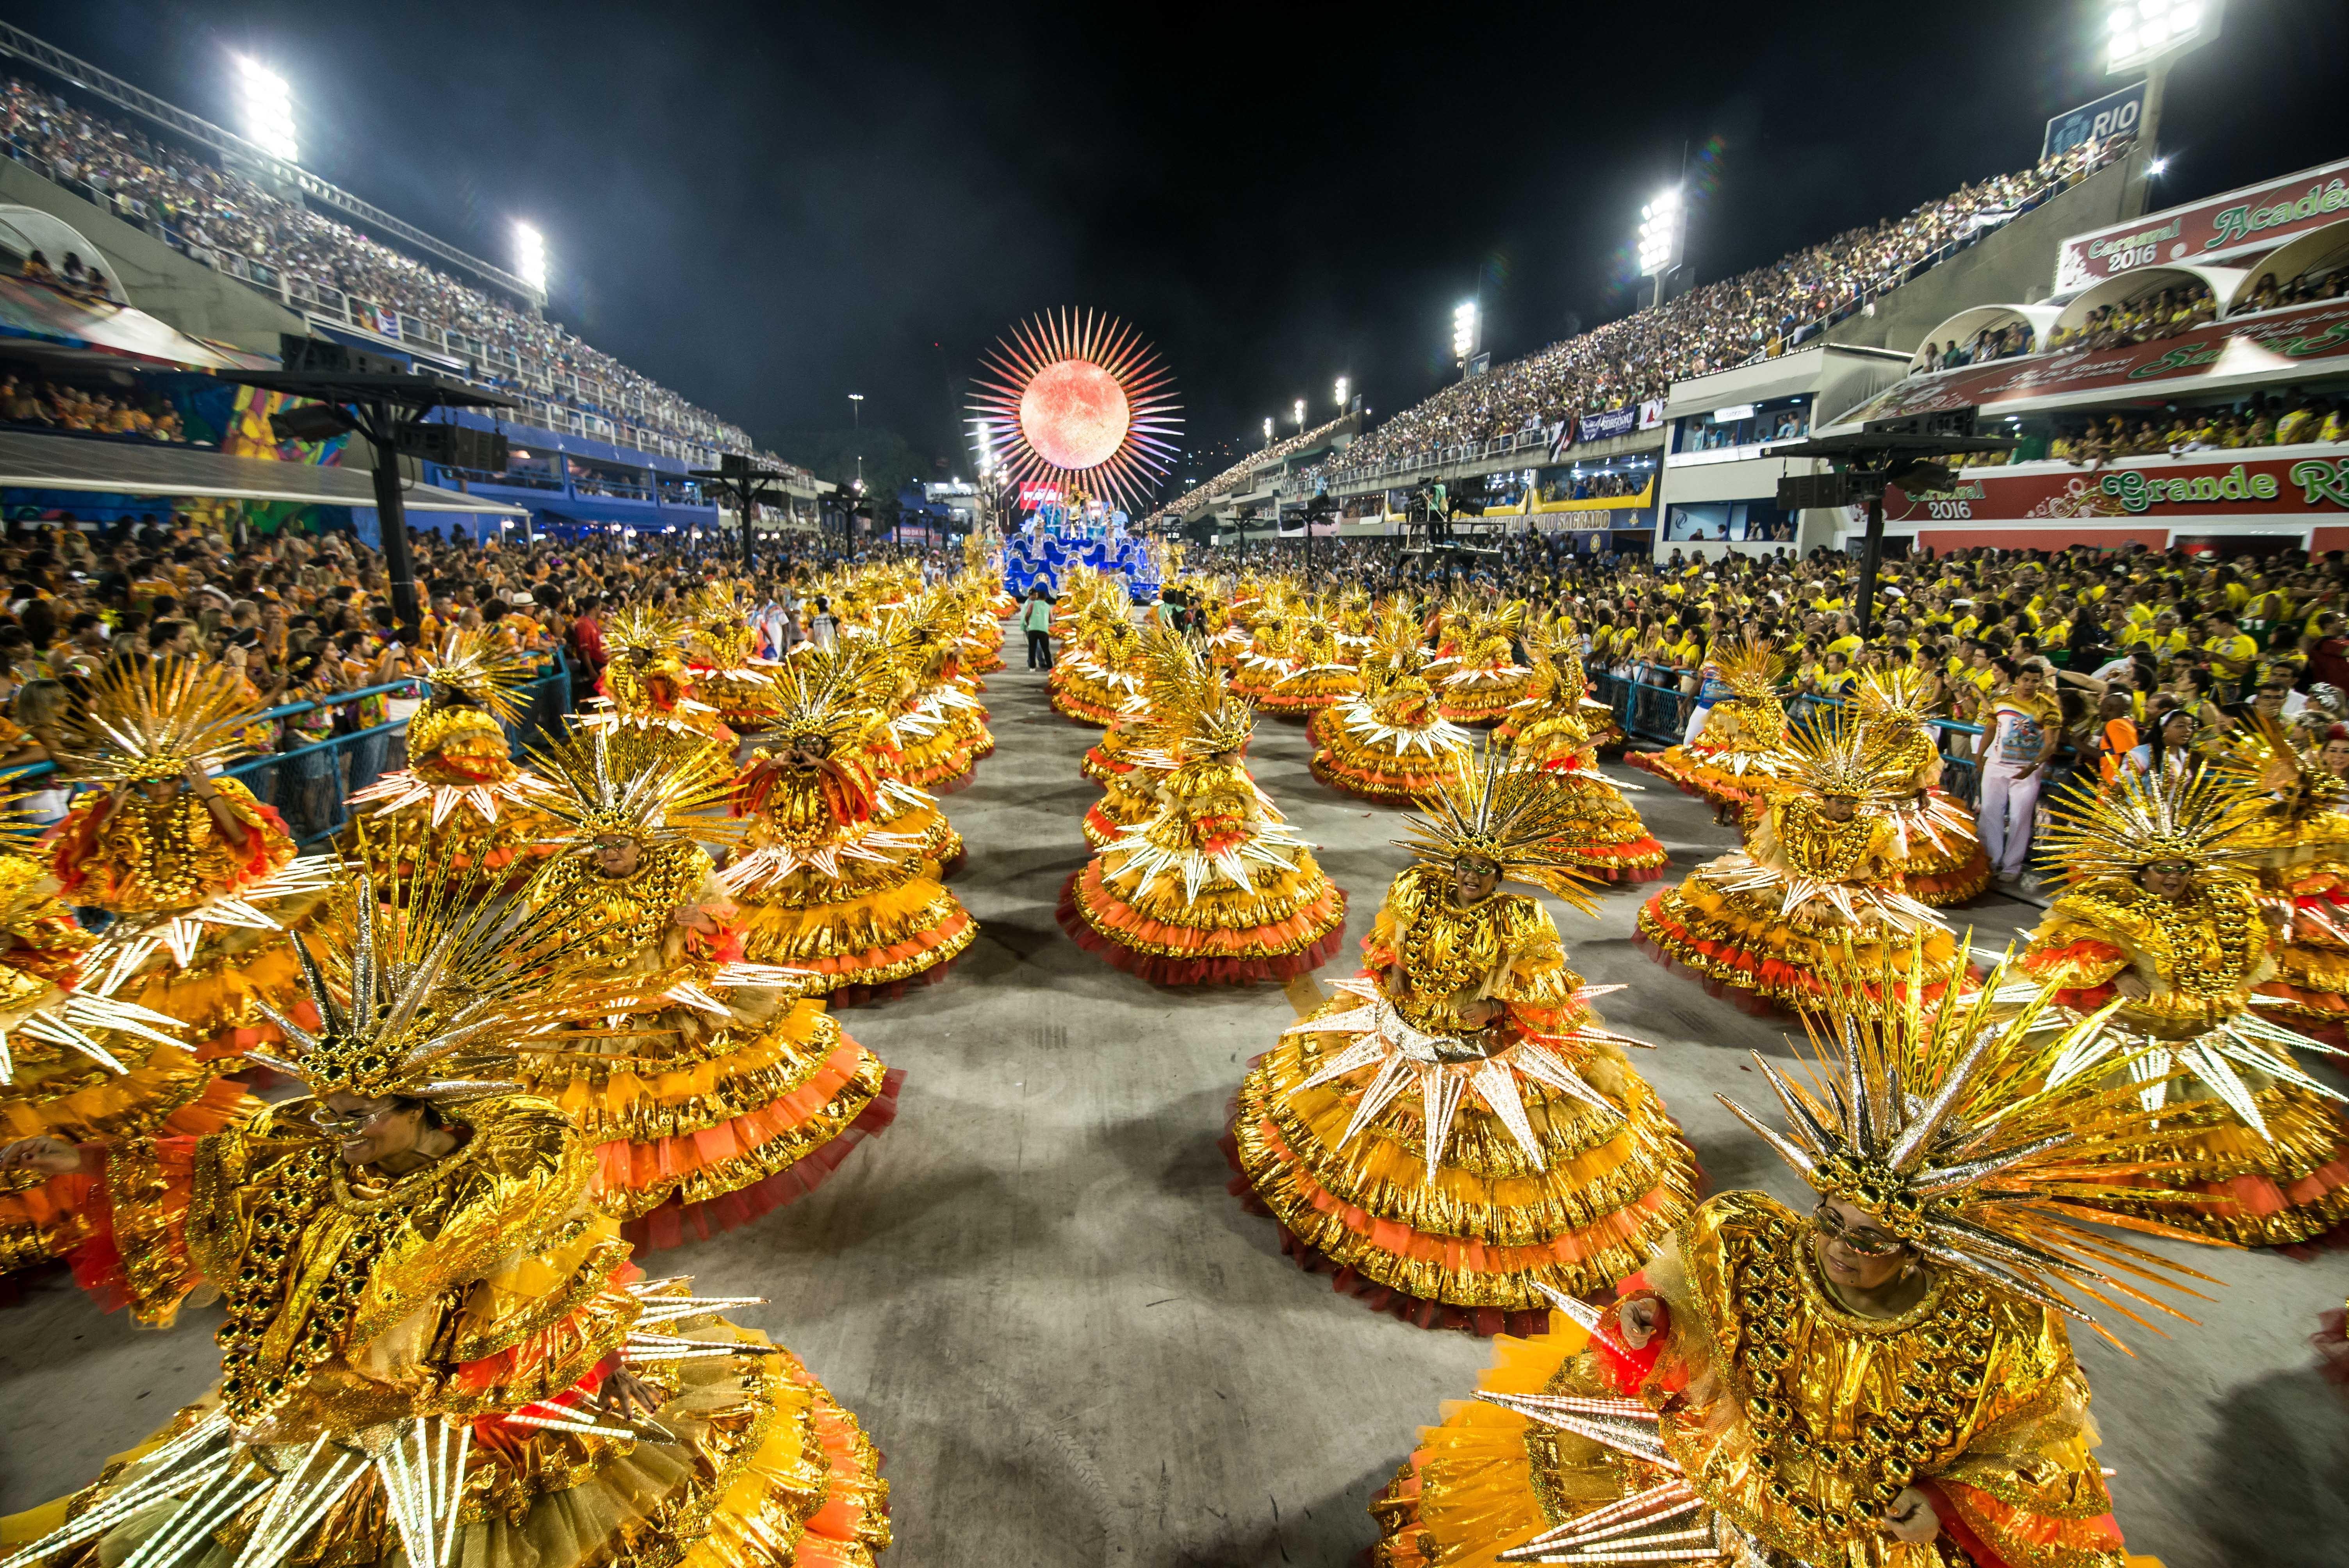 1. Carnaval de Tenerife, España